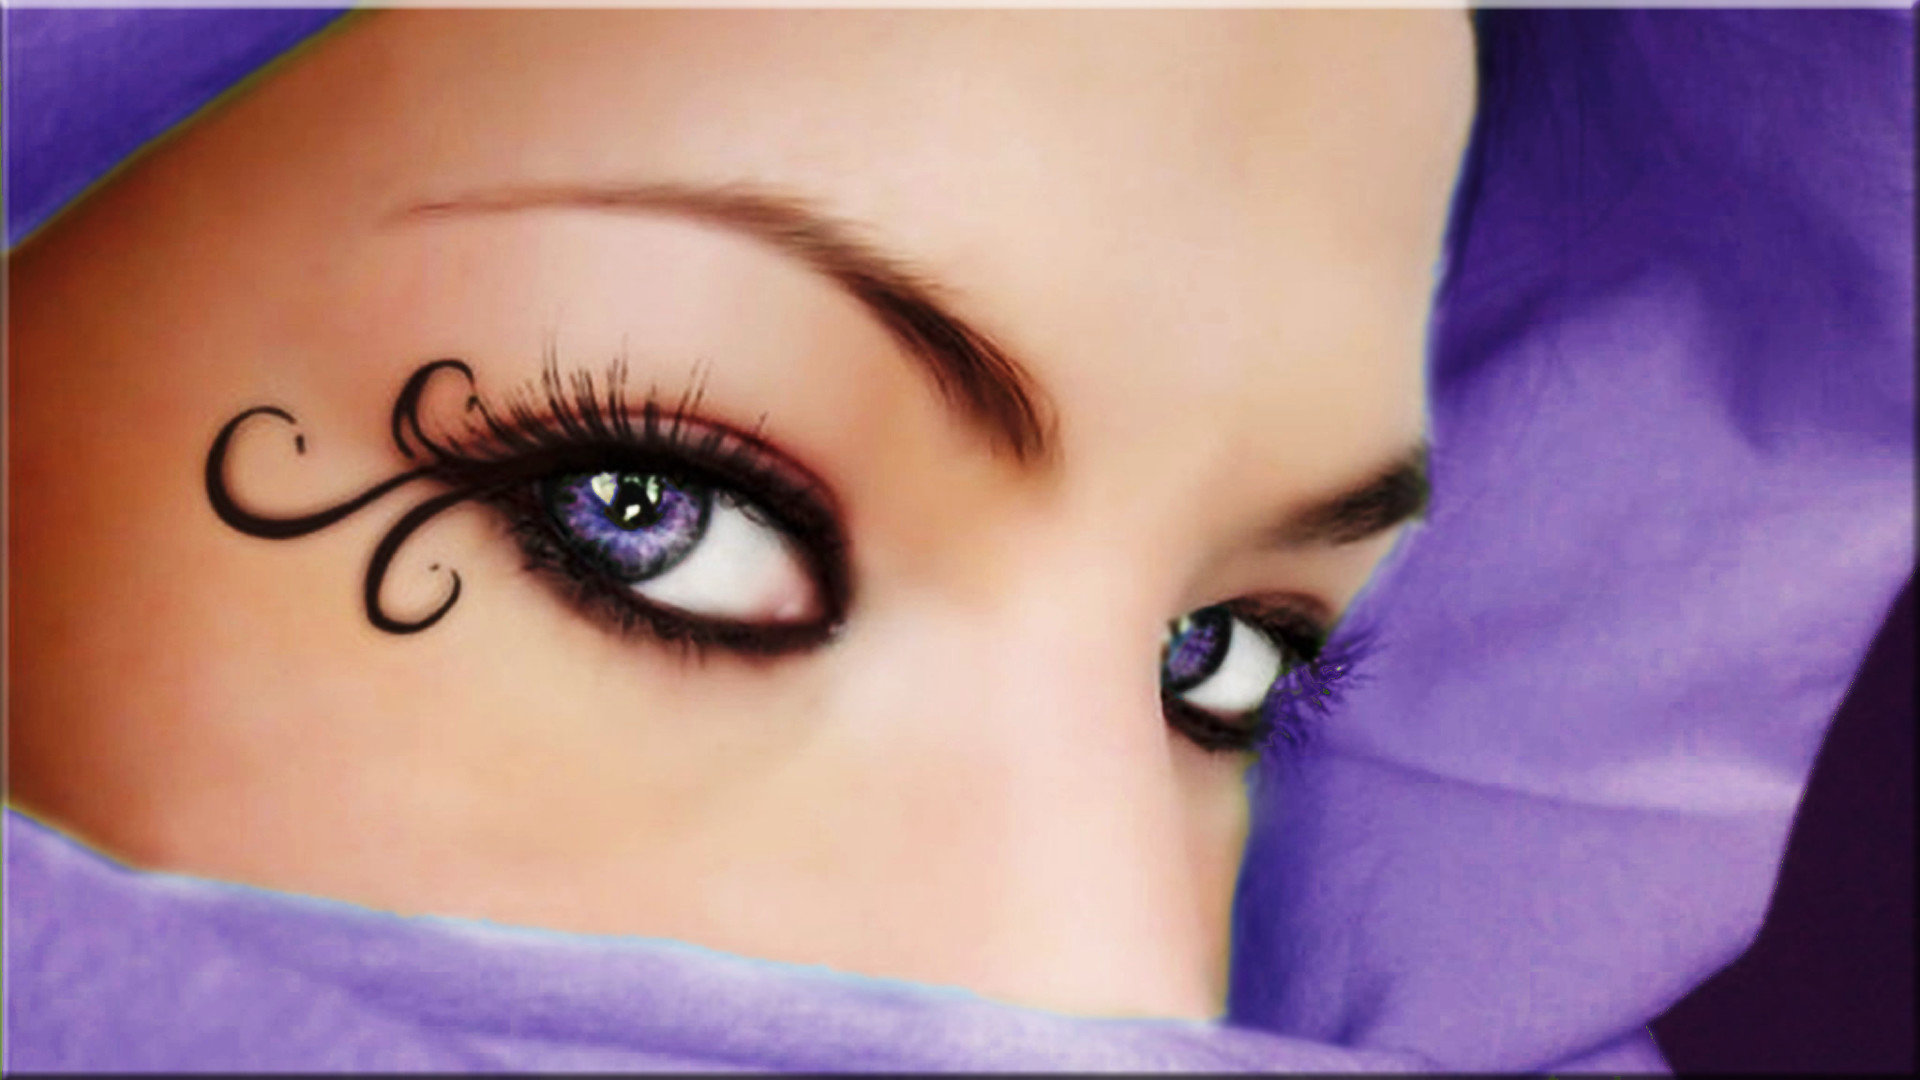 Free Eye High Quality Wallpaper Id - Beautiful Purple Eyed Woman - HD Wallpaper